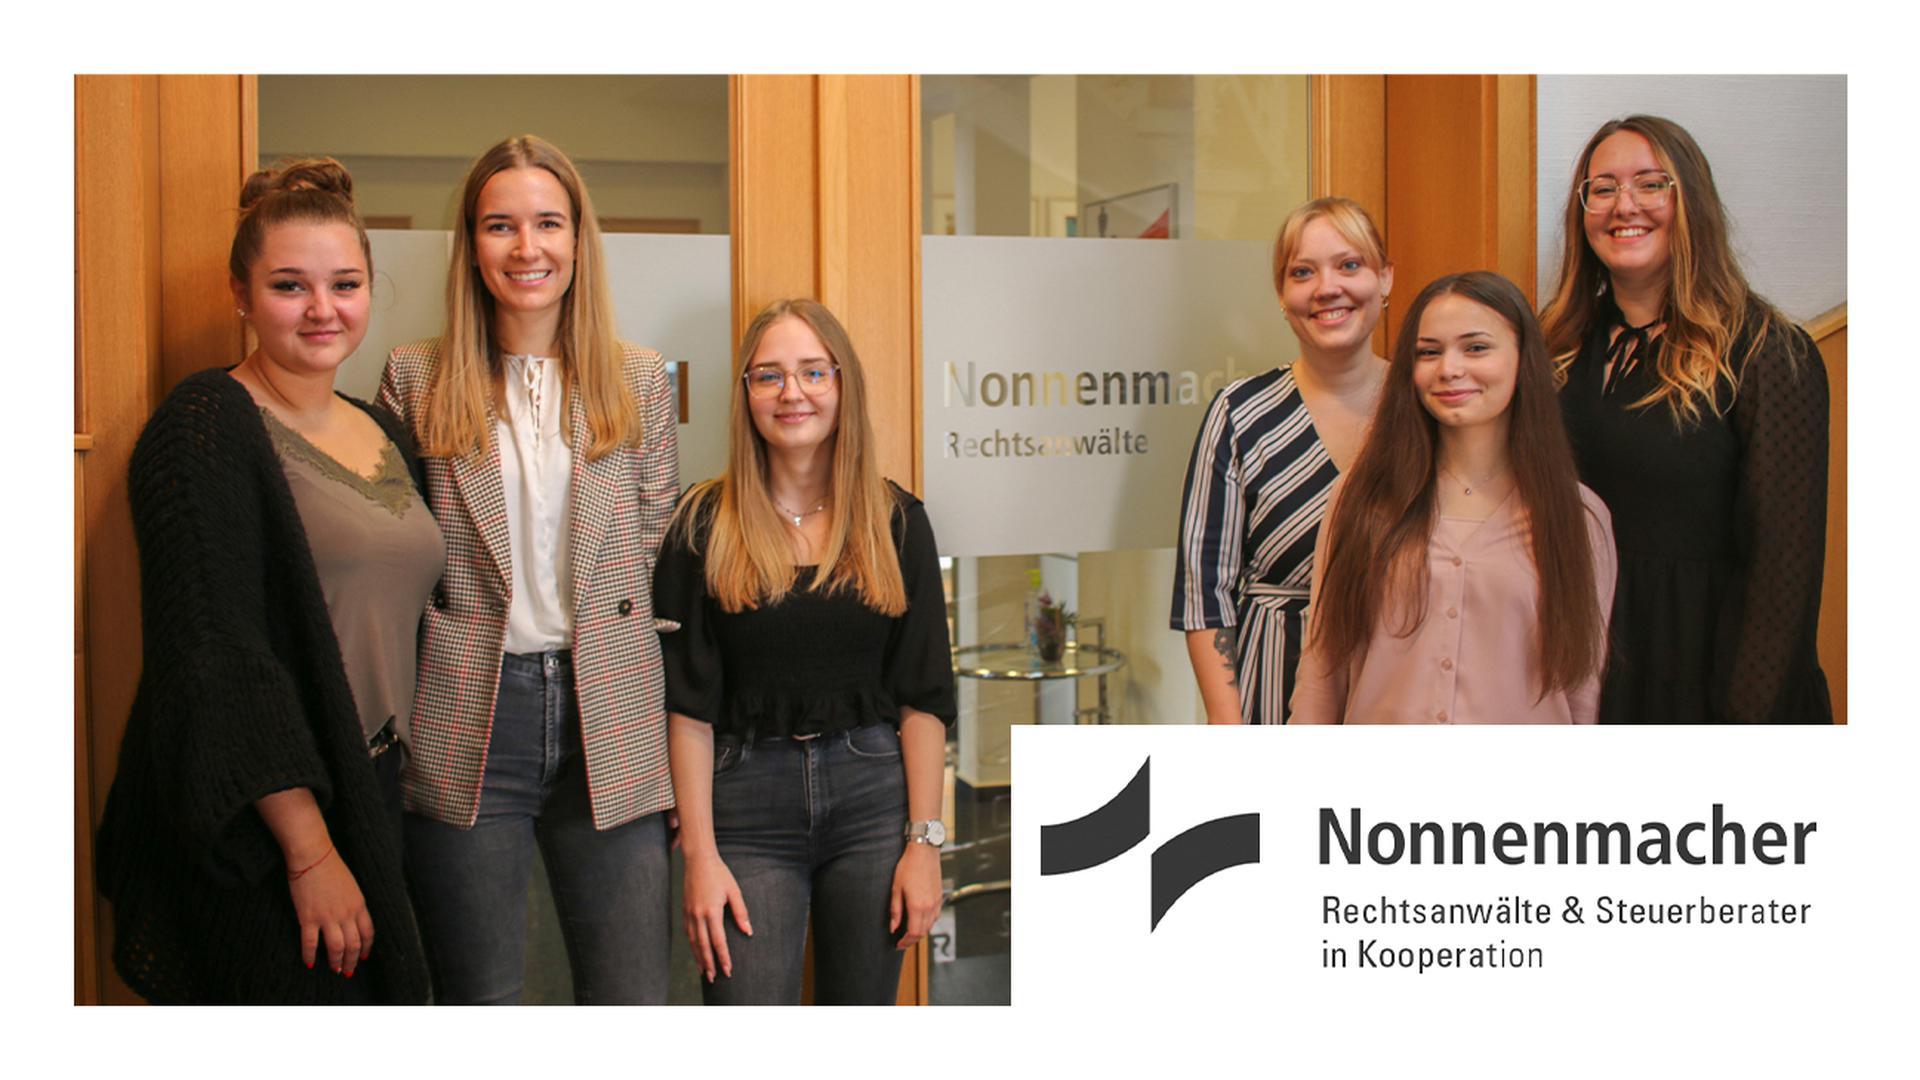 Nonnenmacher Rechtsanwälte & Steuerberater in Kooperation